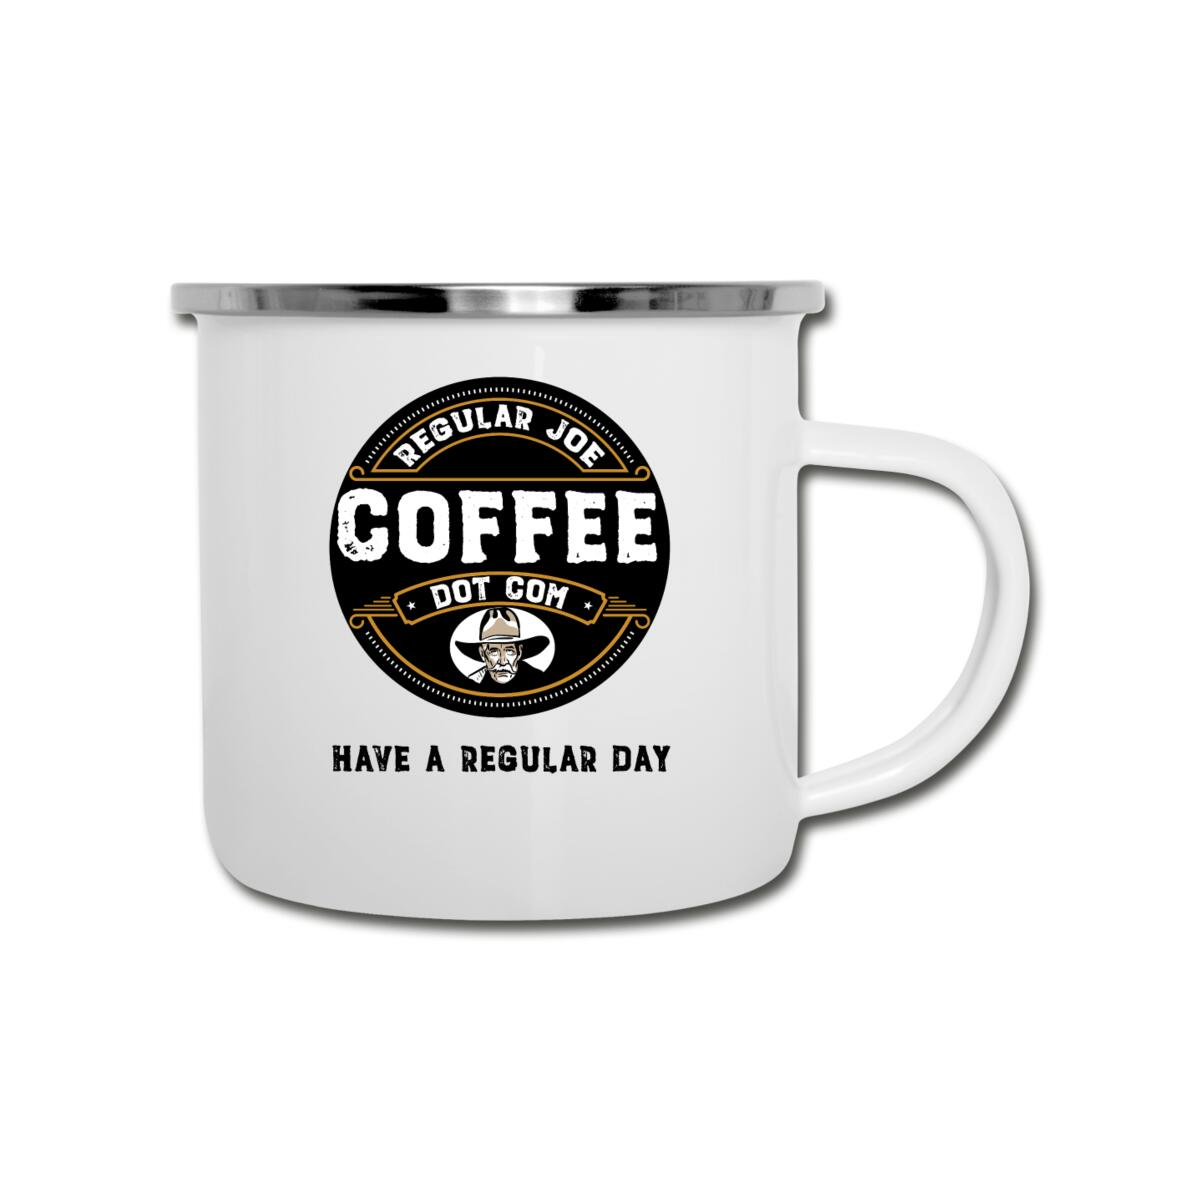 Have A Regular Day Mug